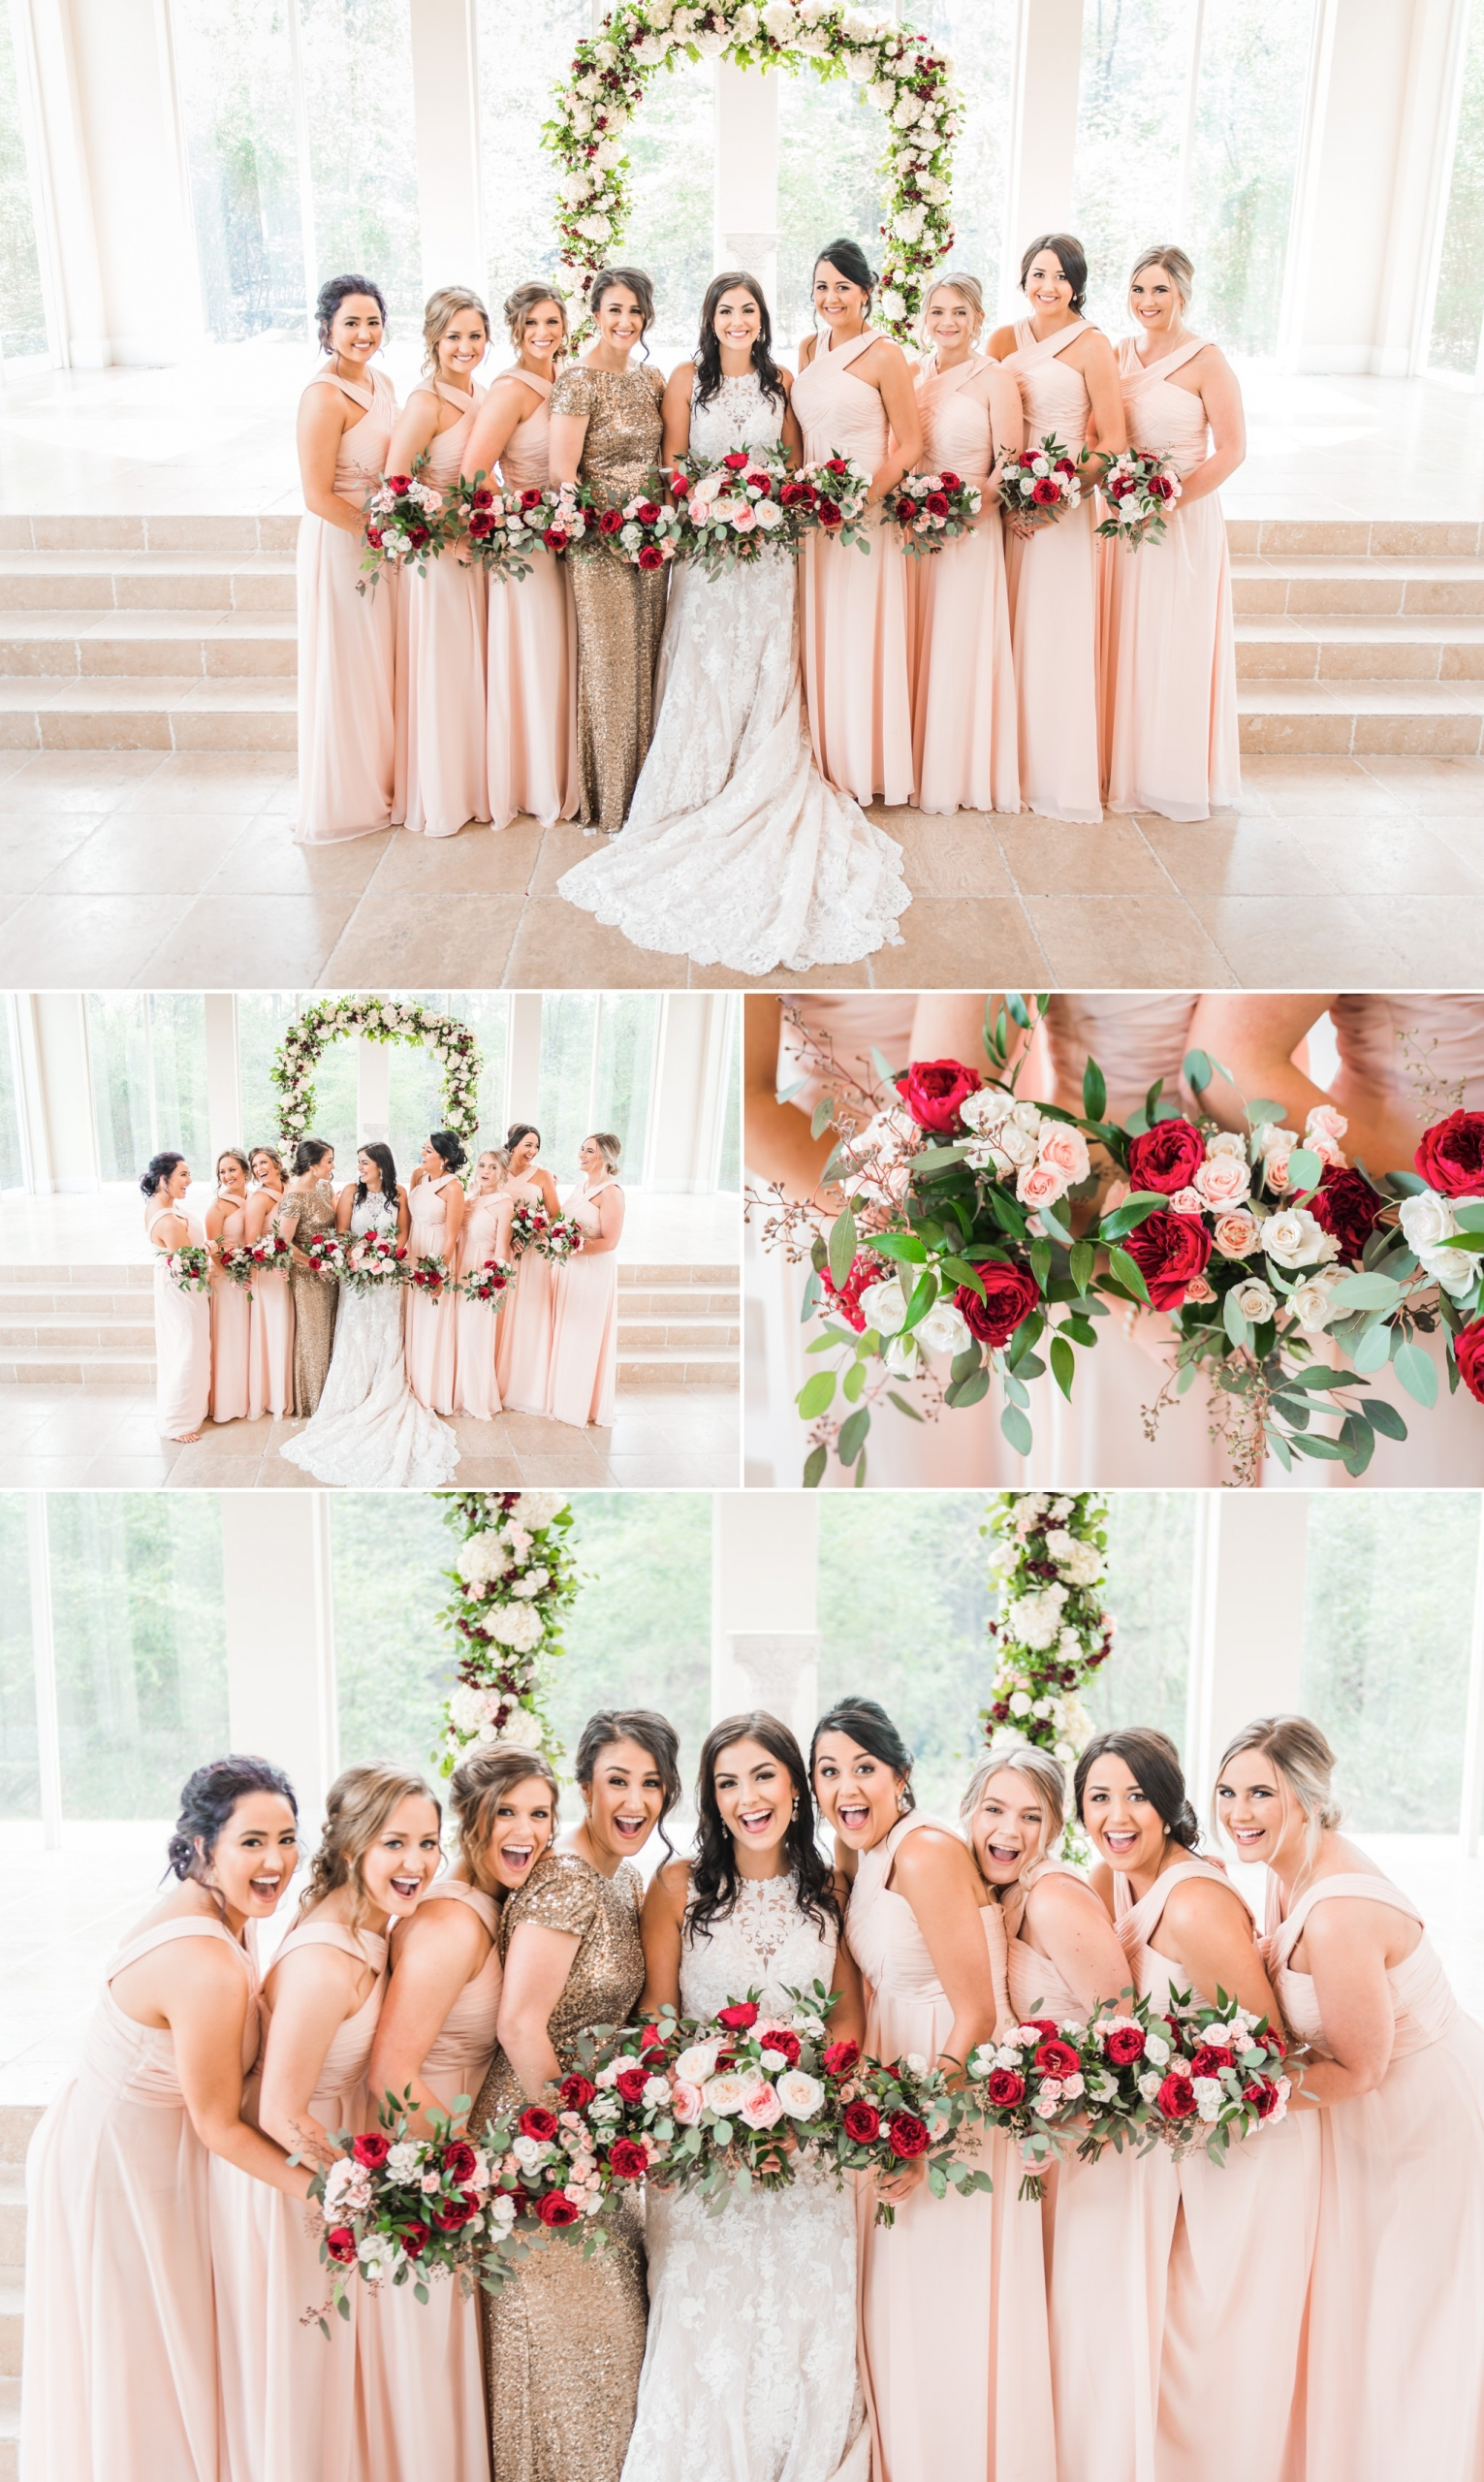 Ashton Gardens North Bride and Bridesmaids